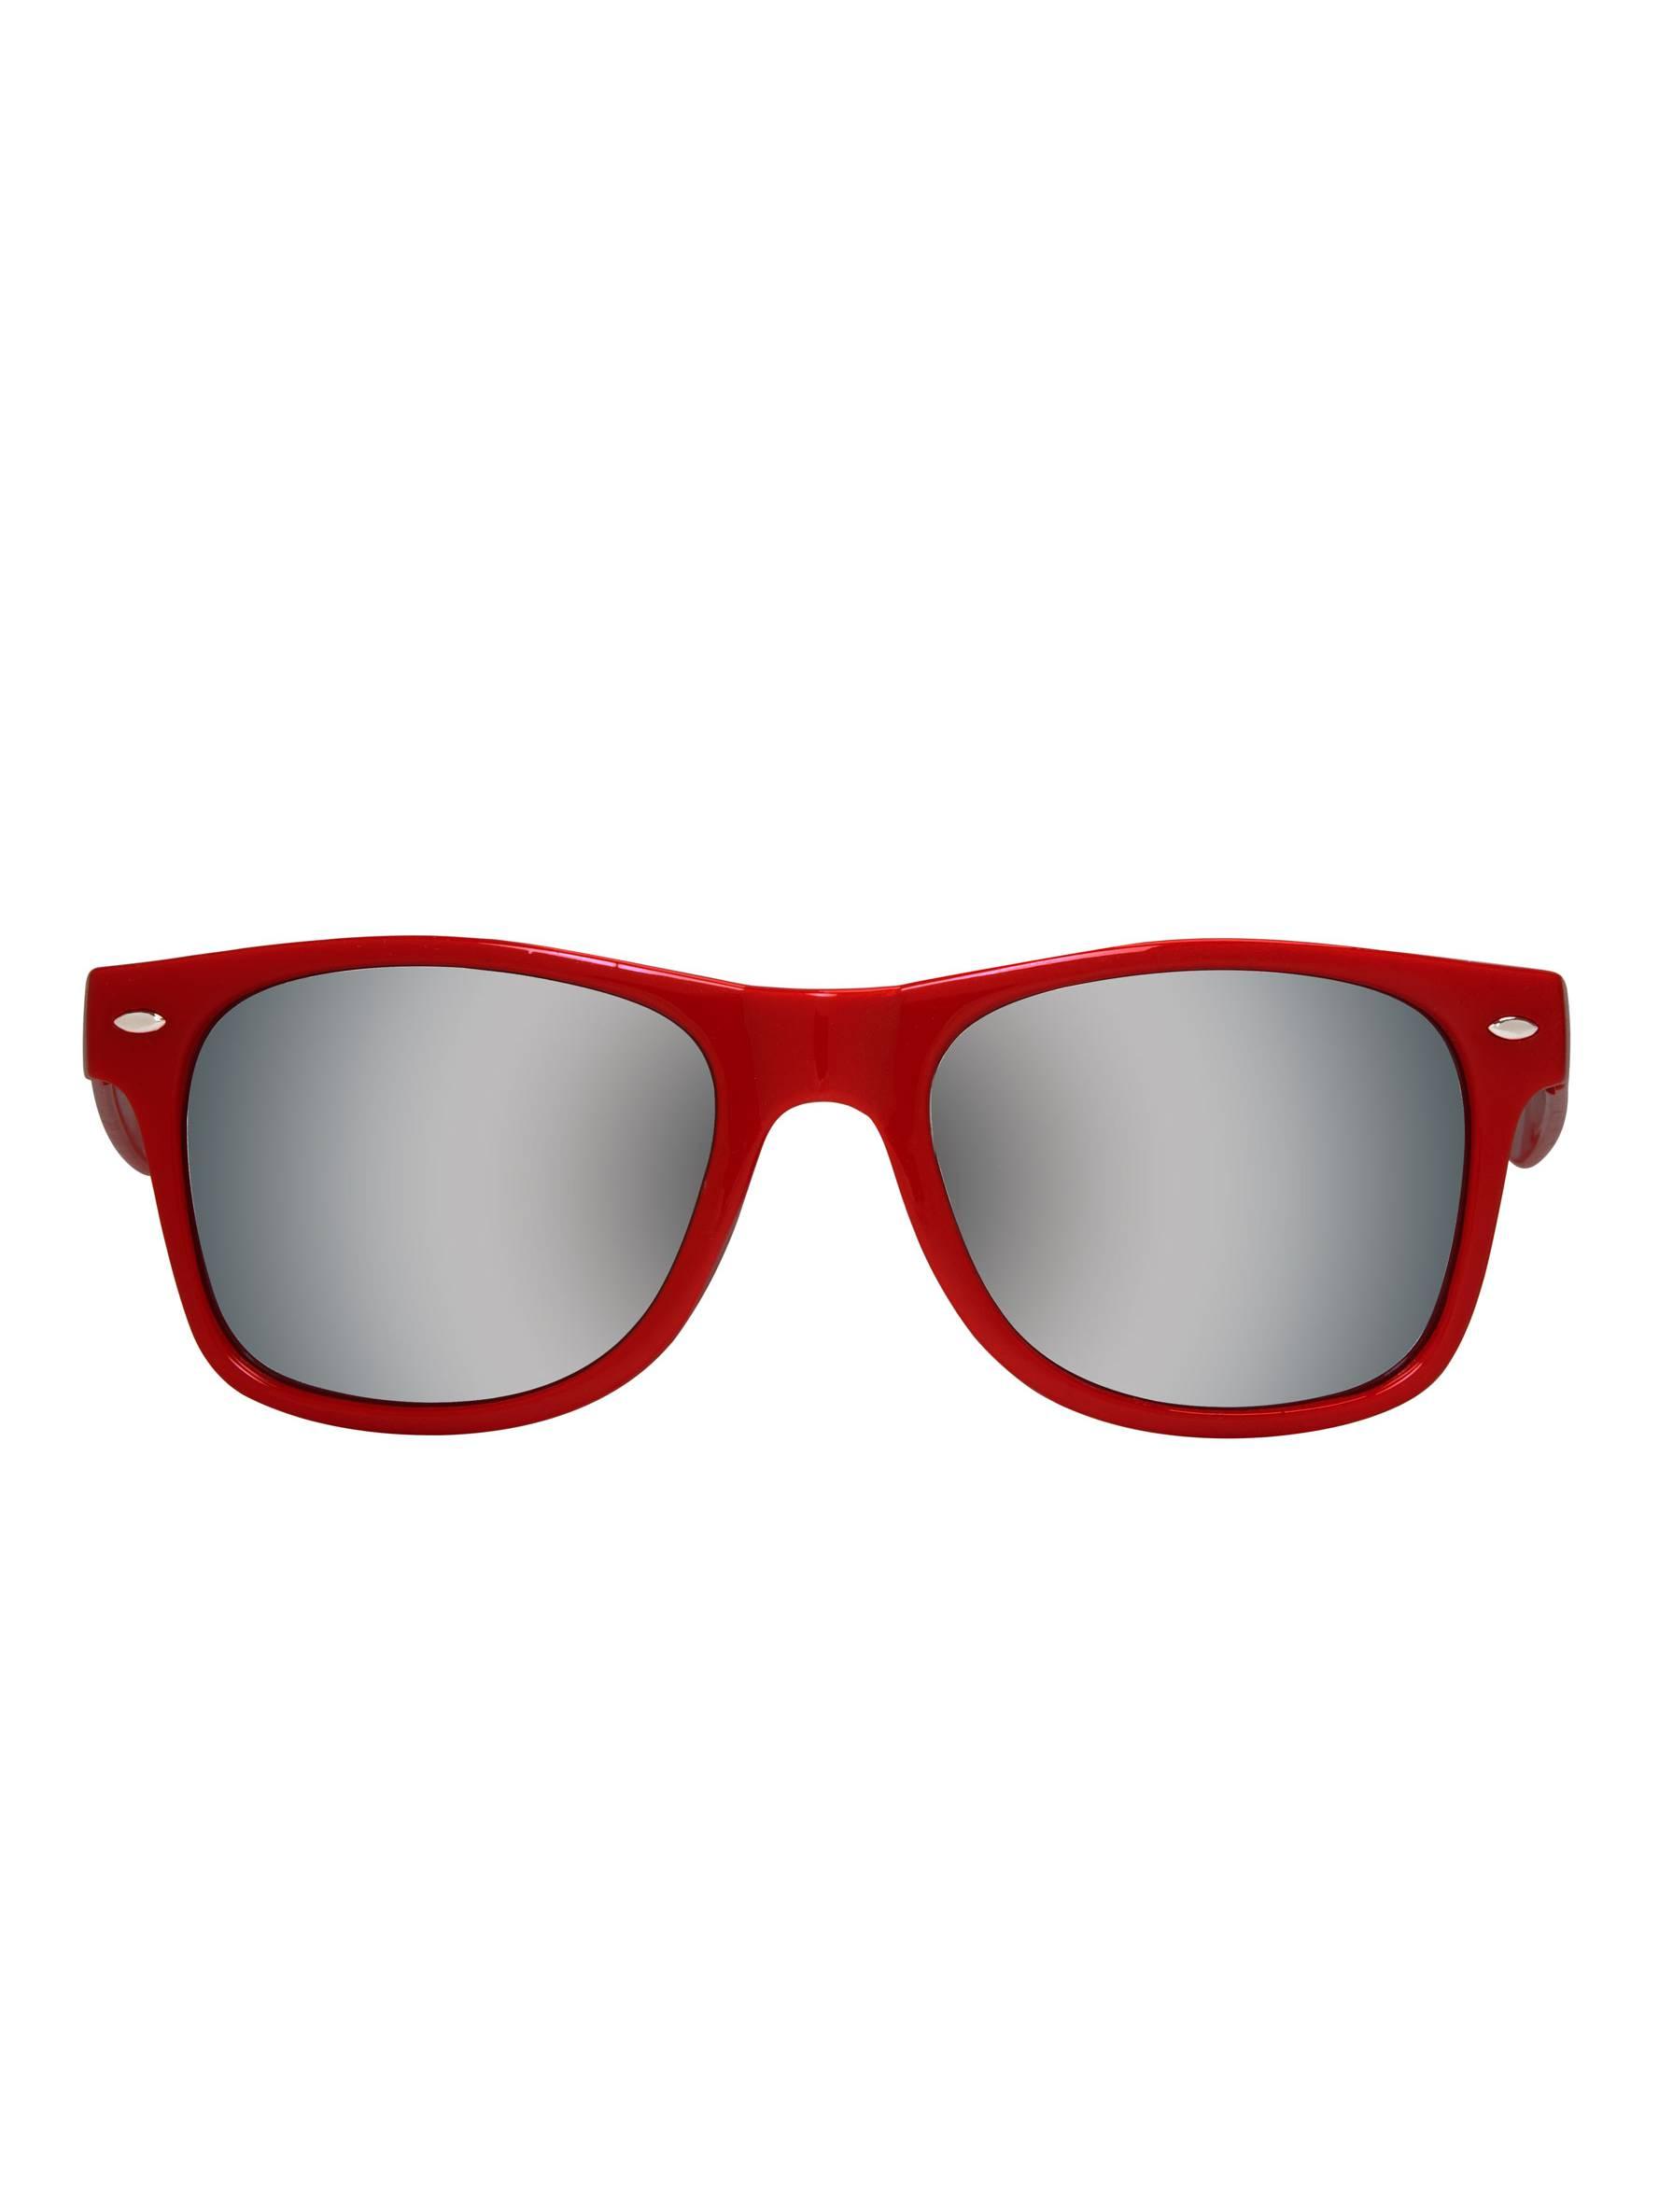 9b32f8d9803 Gravity Shades Horn-Rimmed Mirror Sunglasses